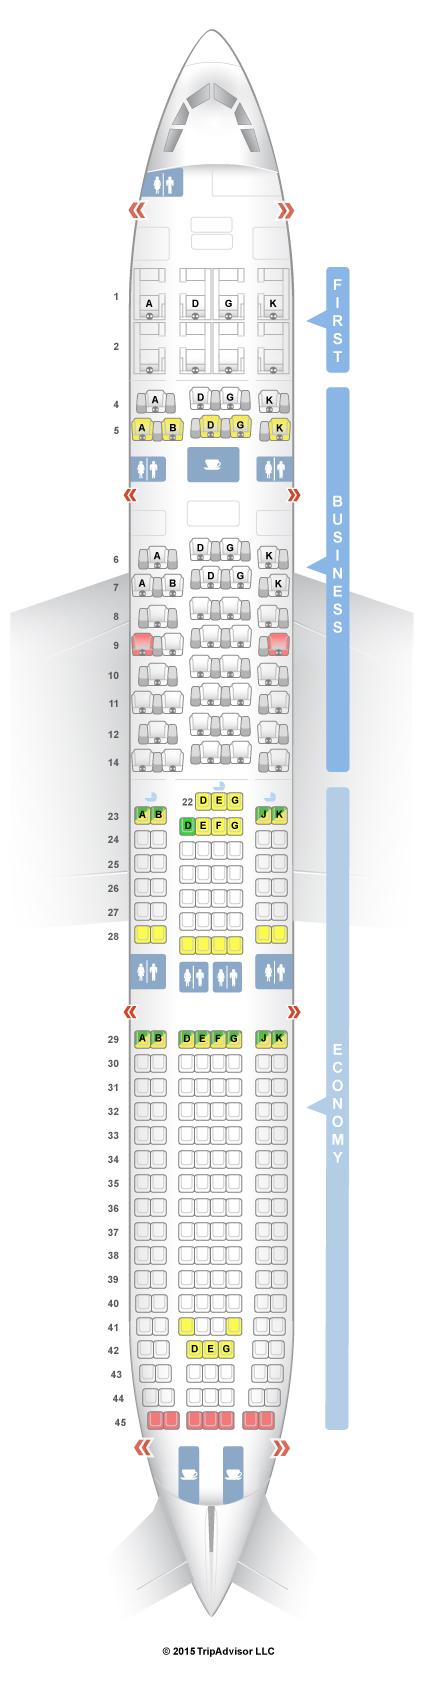 Airbus A330-300 Seat Map SeatGuru Seat Map SWISS